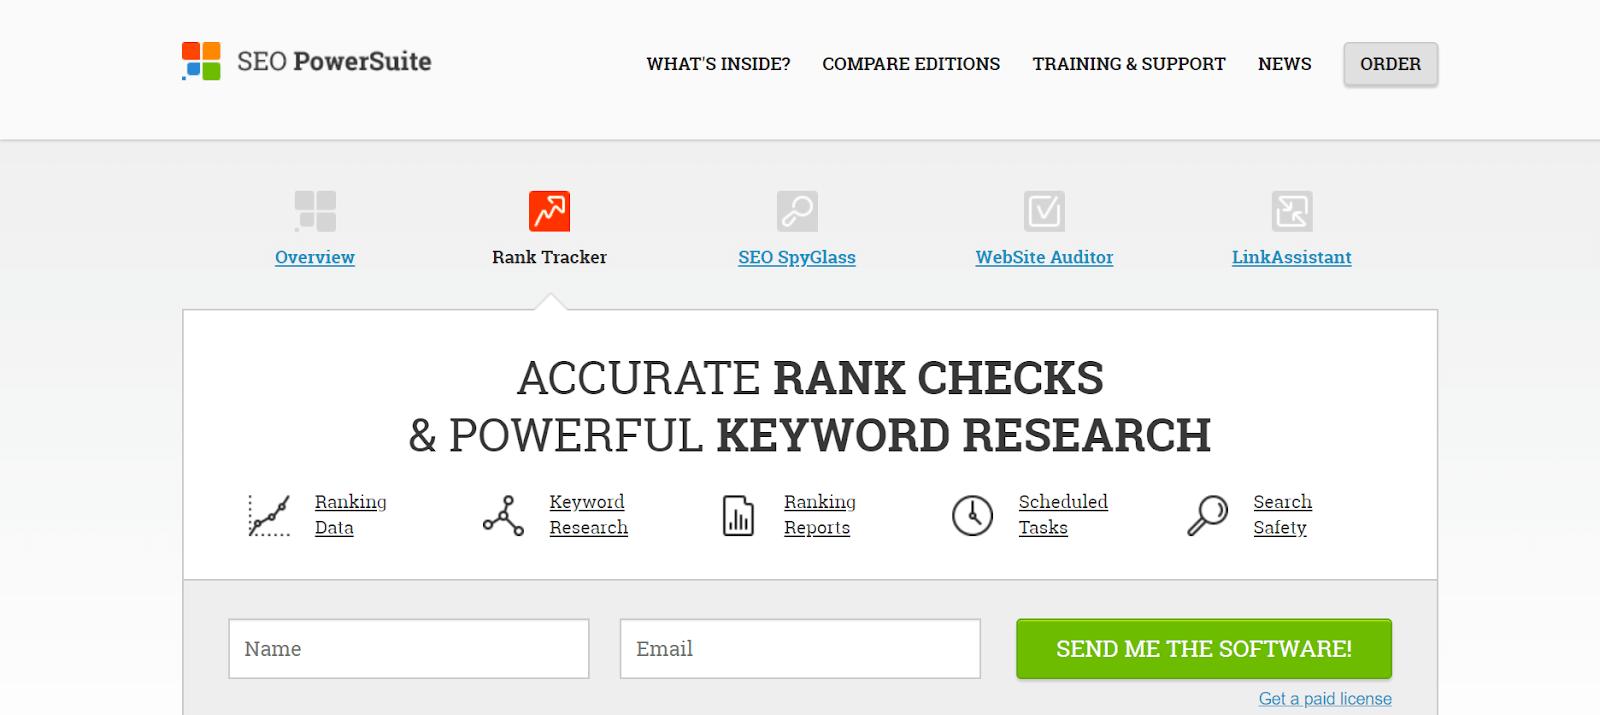 SEO-PowerSuite-Rank-Tracker-Tools